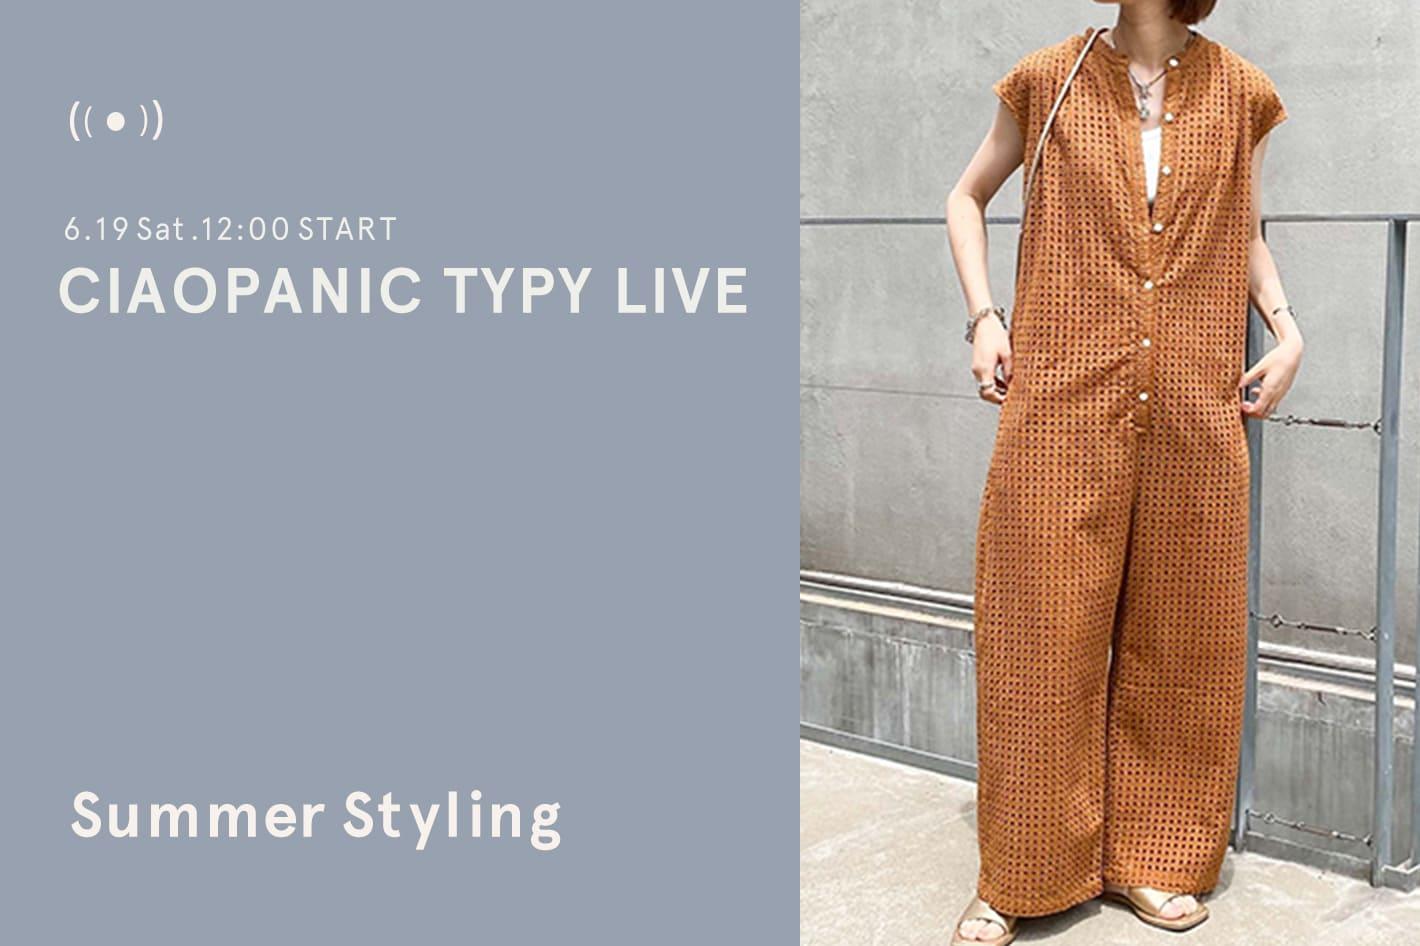 CIAOPANIC TYPY 【CIAOPANIC TYPY LIVE】6/19(土)12:00~ START!Summer Styling